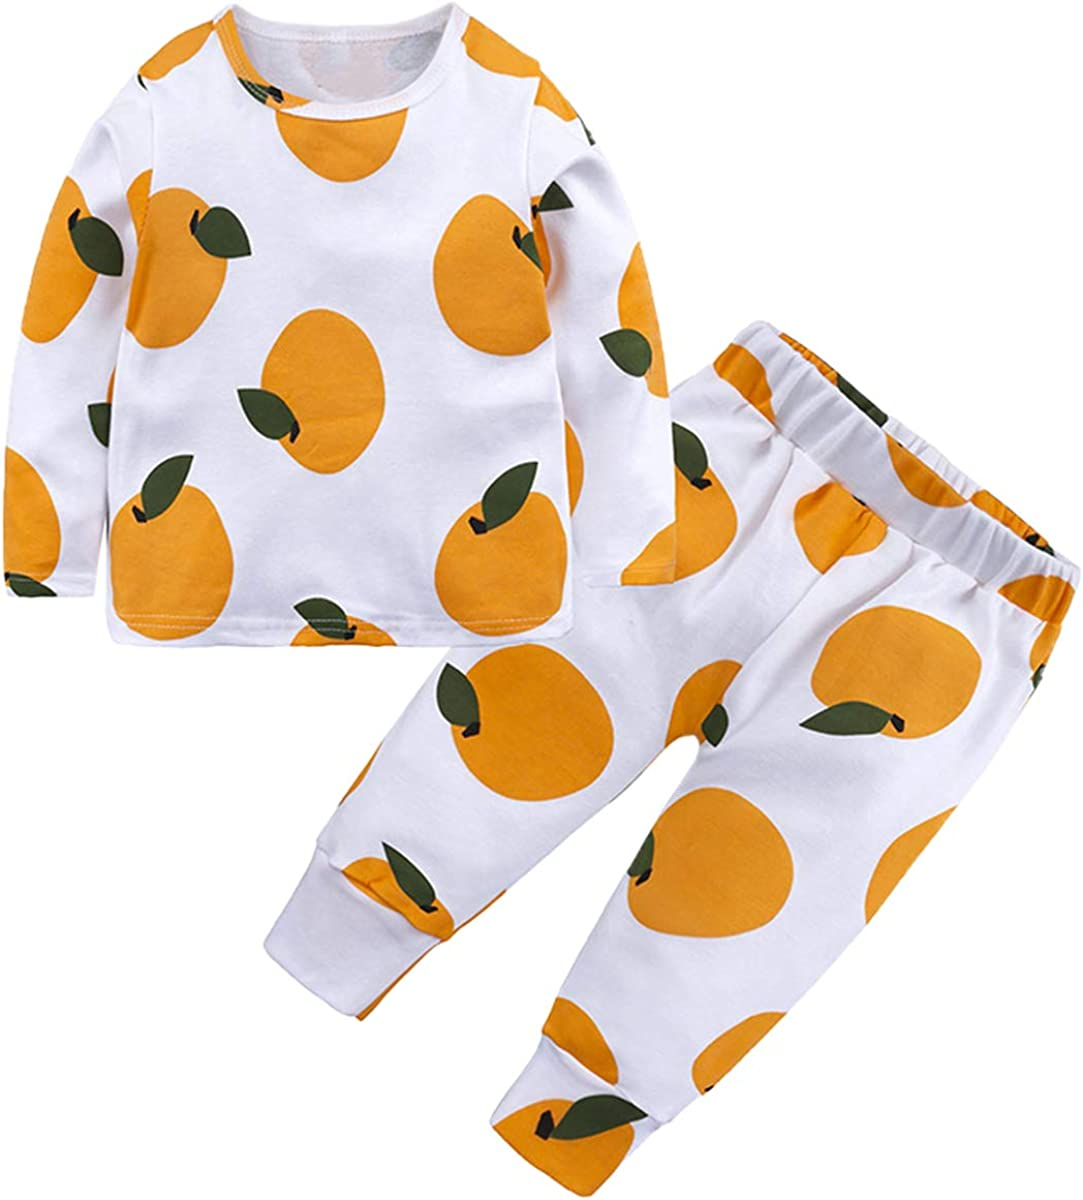 Toddler Girl's Cartoon Print Tops Pants Thermal Underwear Pajamas Sets, Tangerine, 5-6 Years = Tag 140